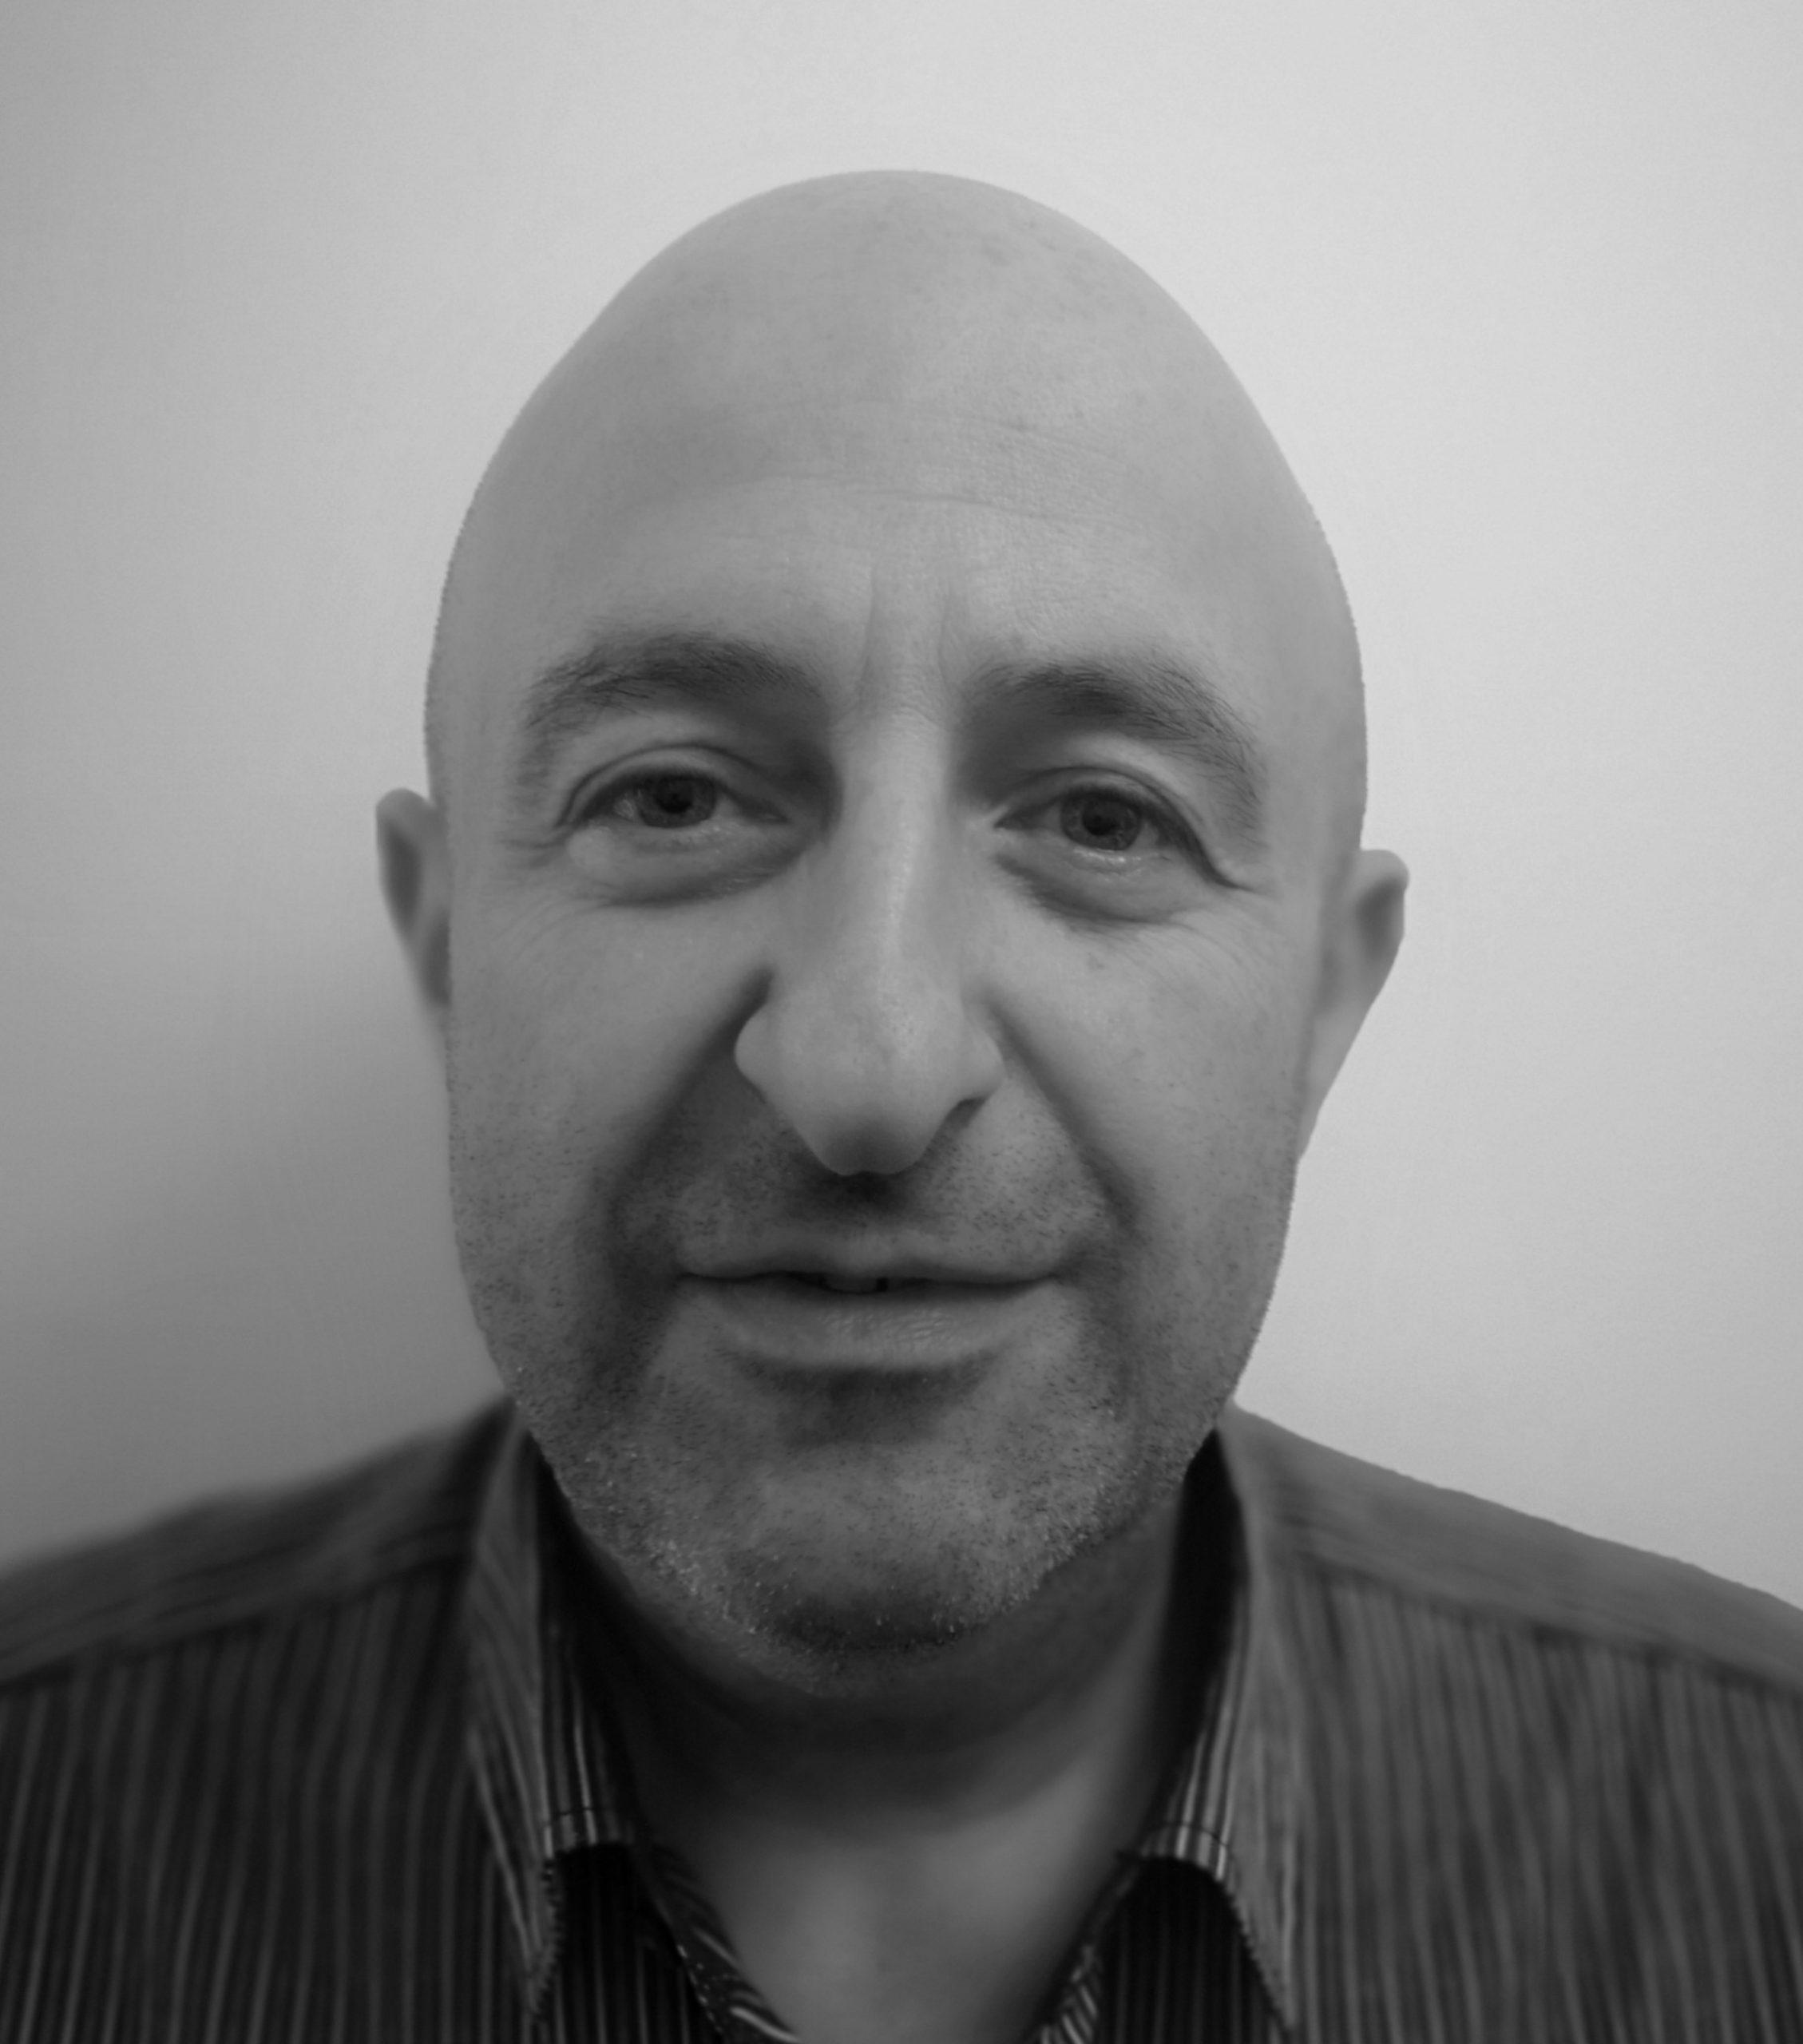 Richard Curen